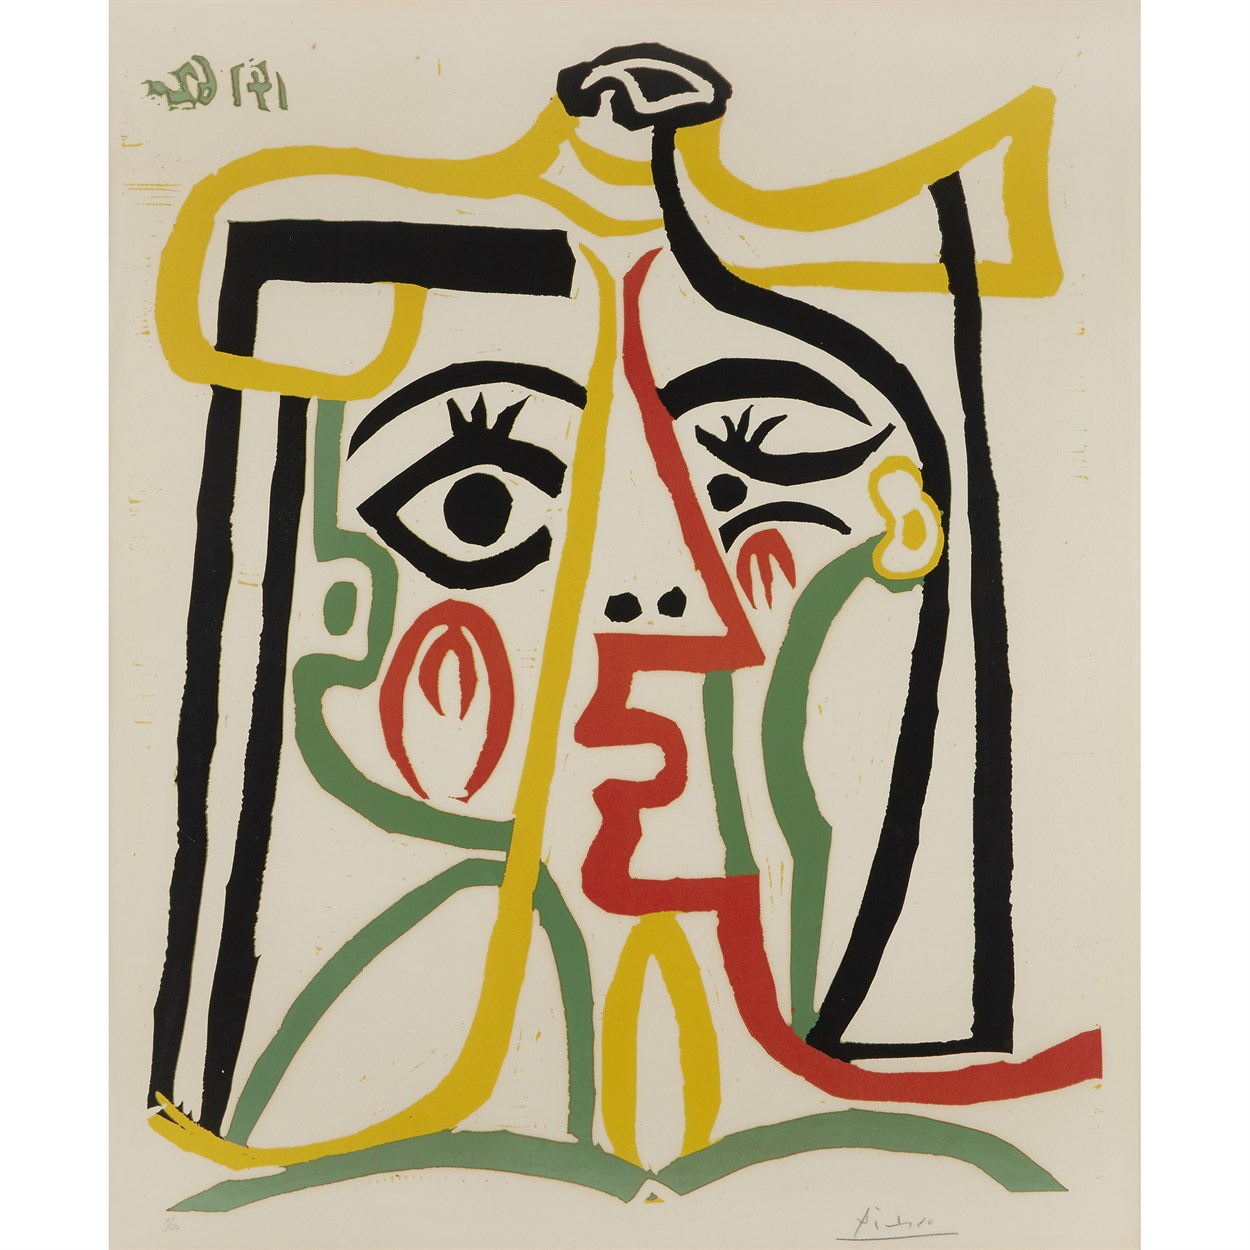 Lot 15 - Pablo Picasso  (Spanish, 1881-1973)